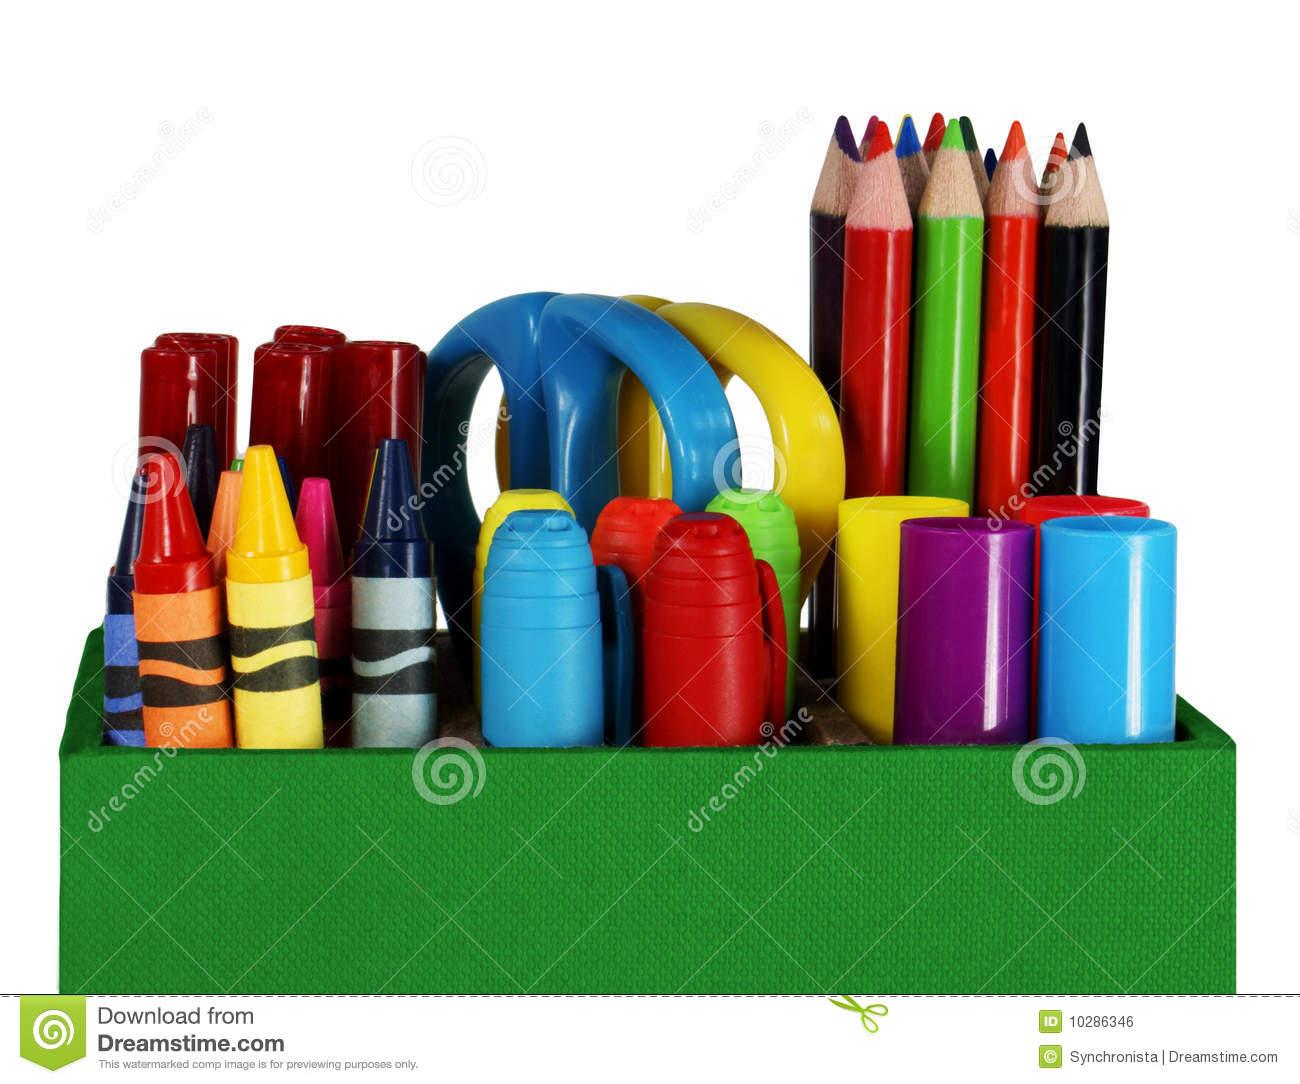 Crayon colored pencil clipart